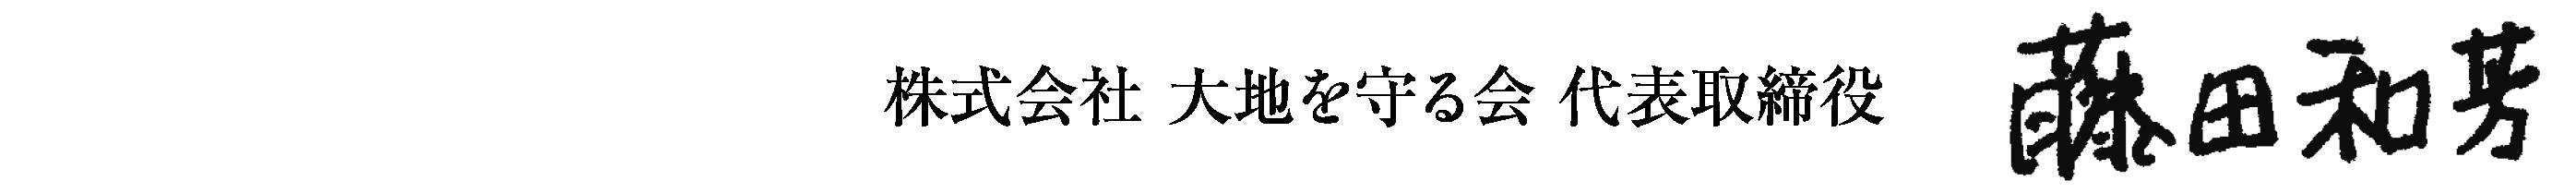 151026_f1_11